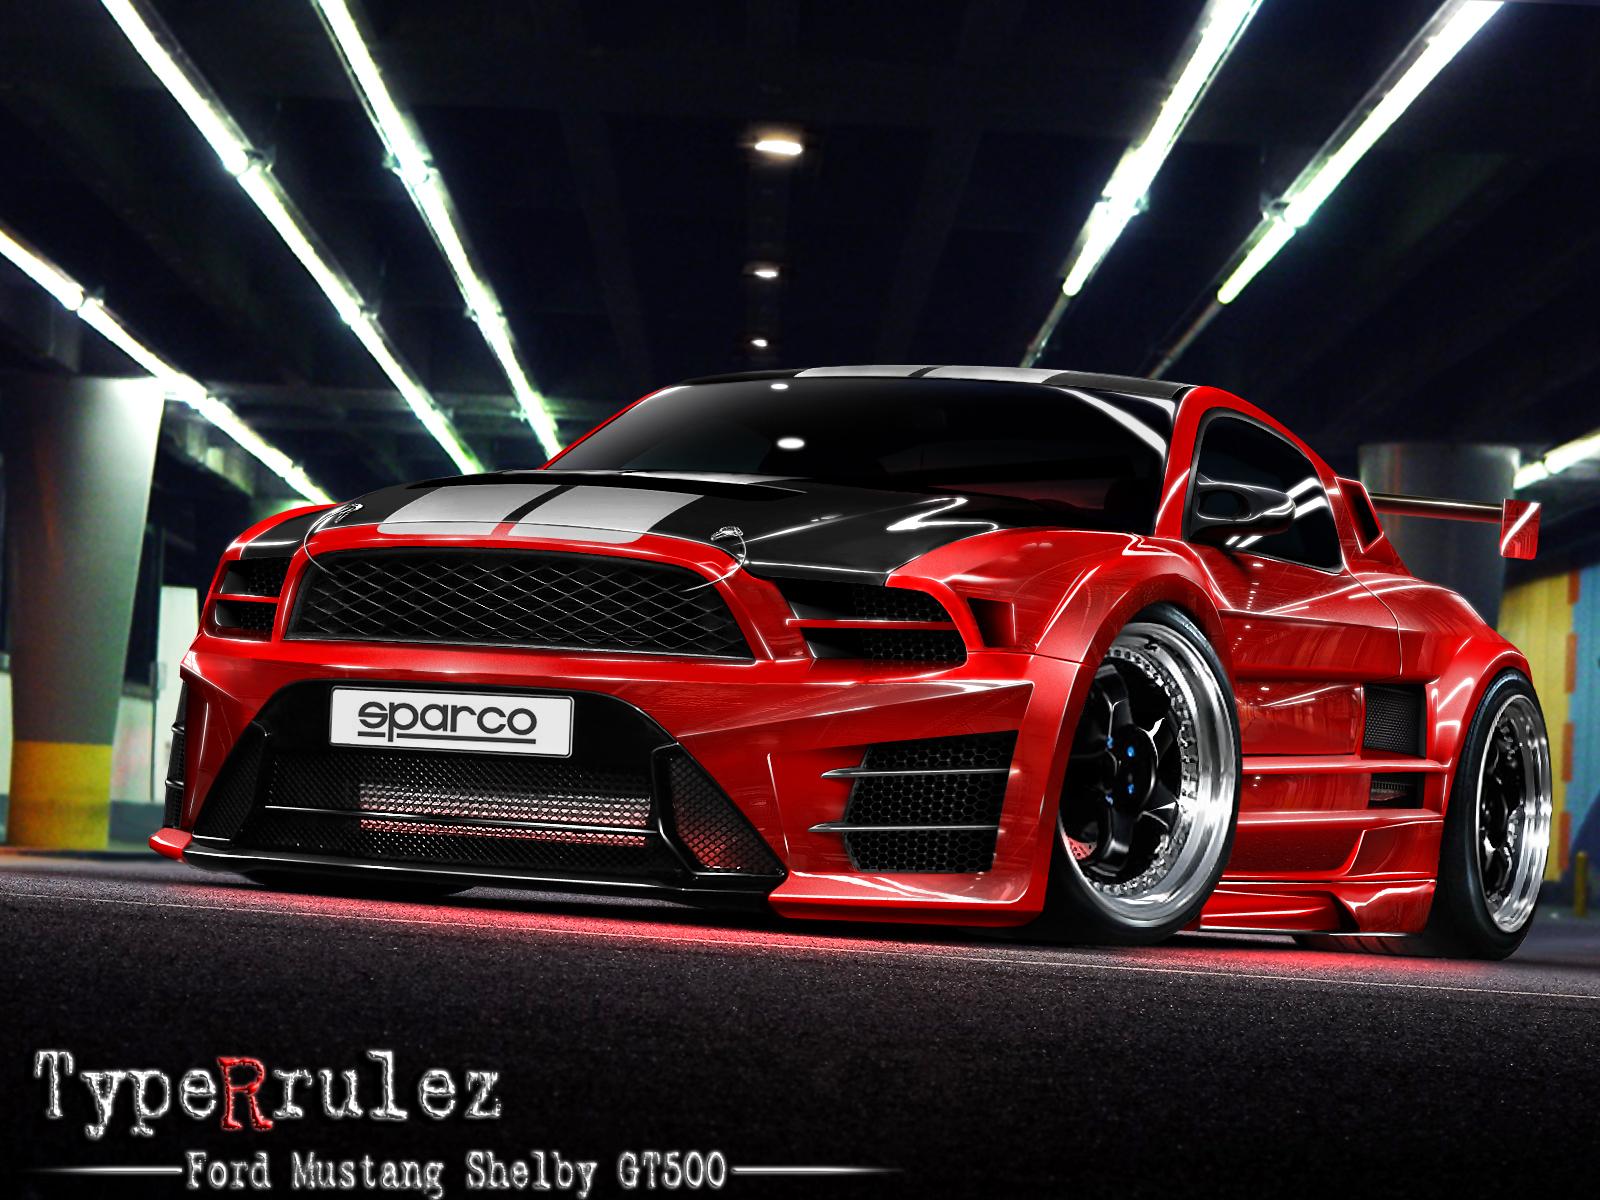 Carros Tunados,carros tuning :wallpapers screensavers